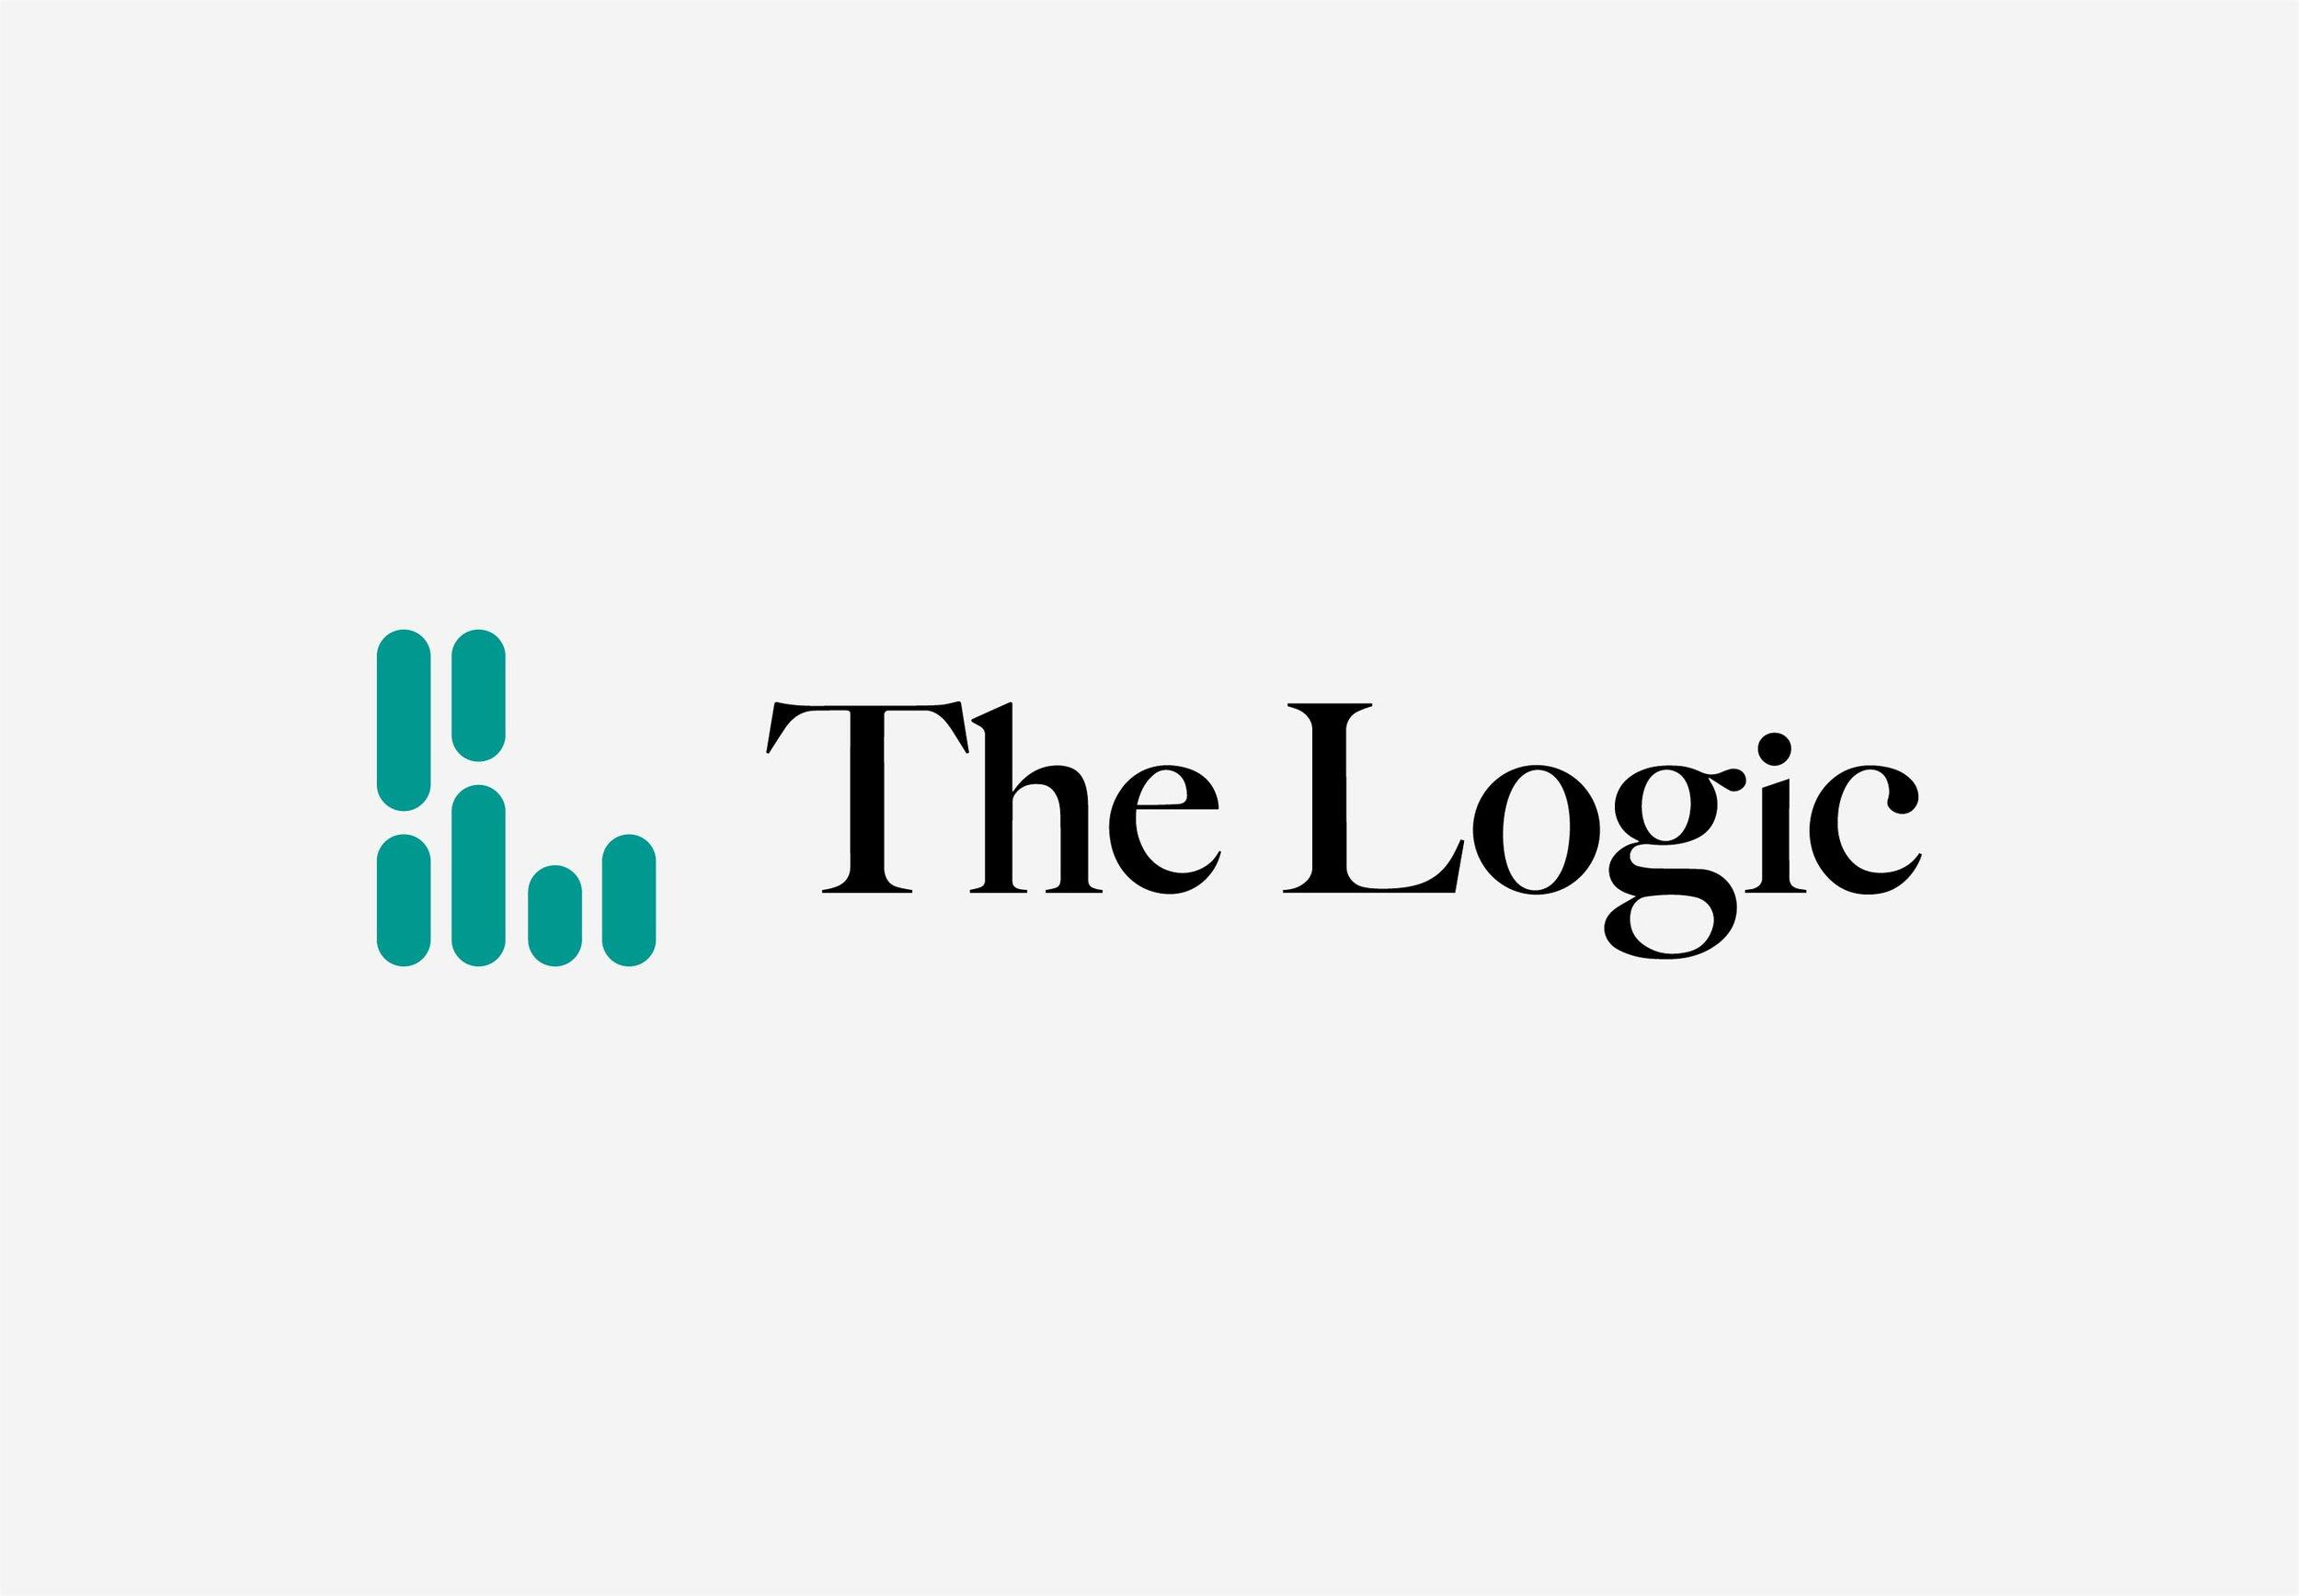 the-logic_logo_1.jpg